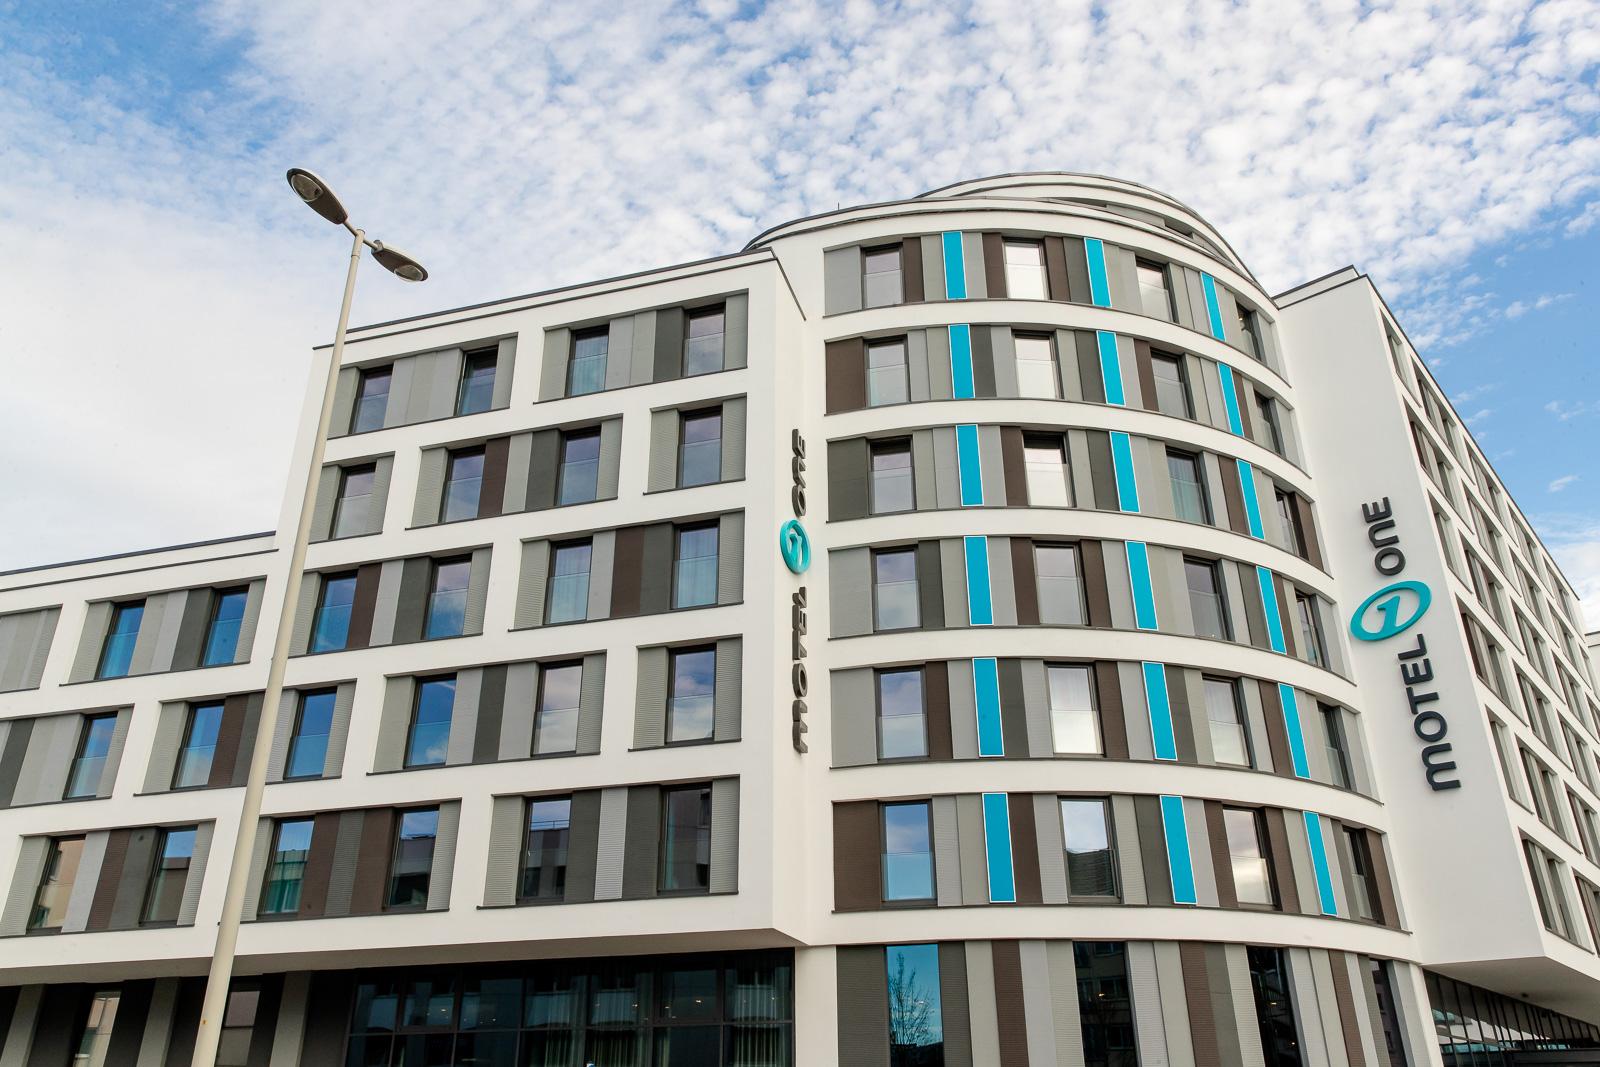 Hotel Bonn Beethoven Motel One Design Hotels Bonn Beethoven Downtown